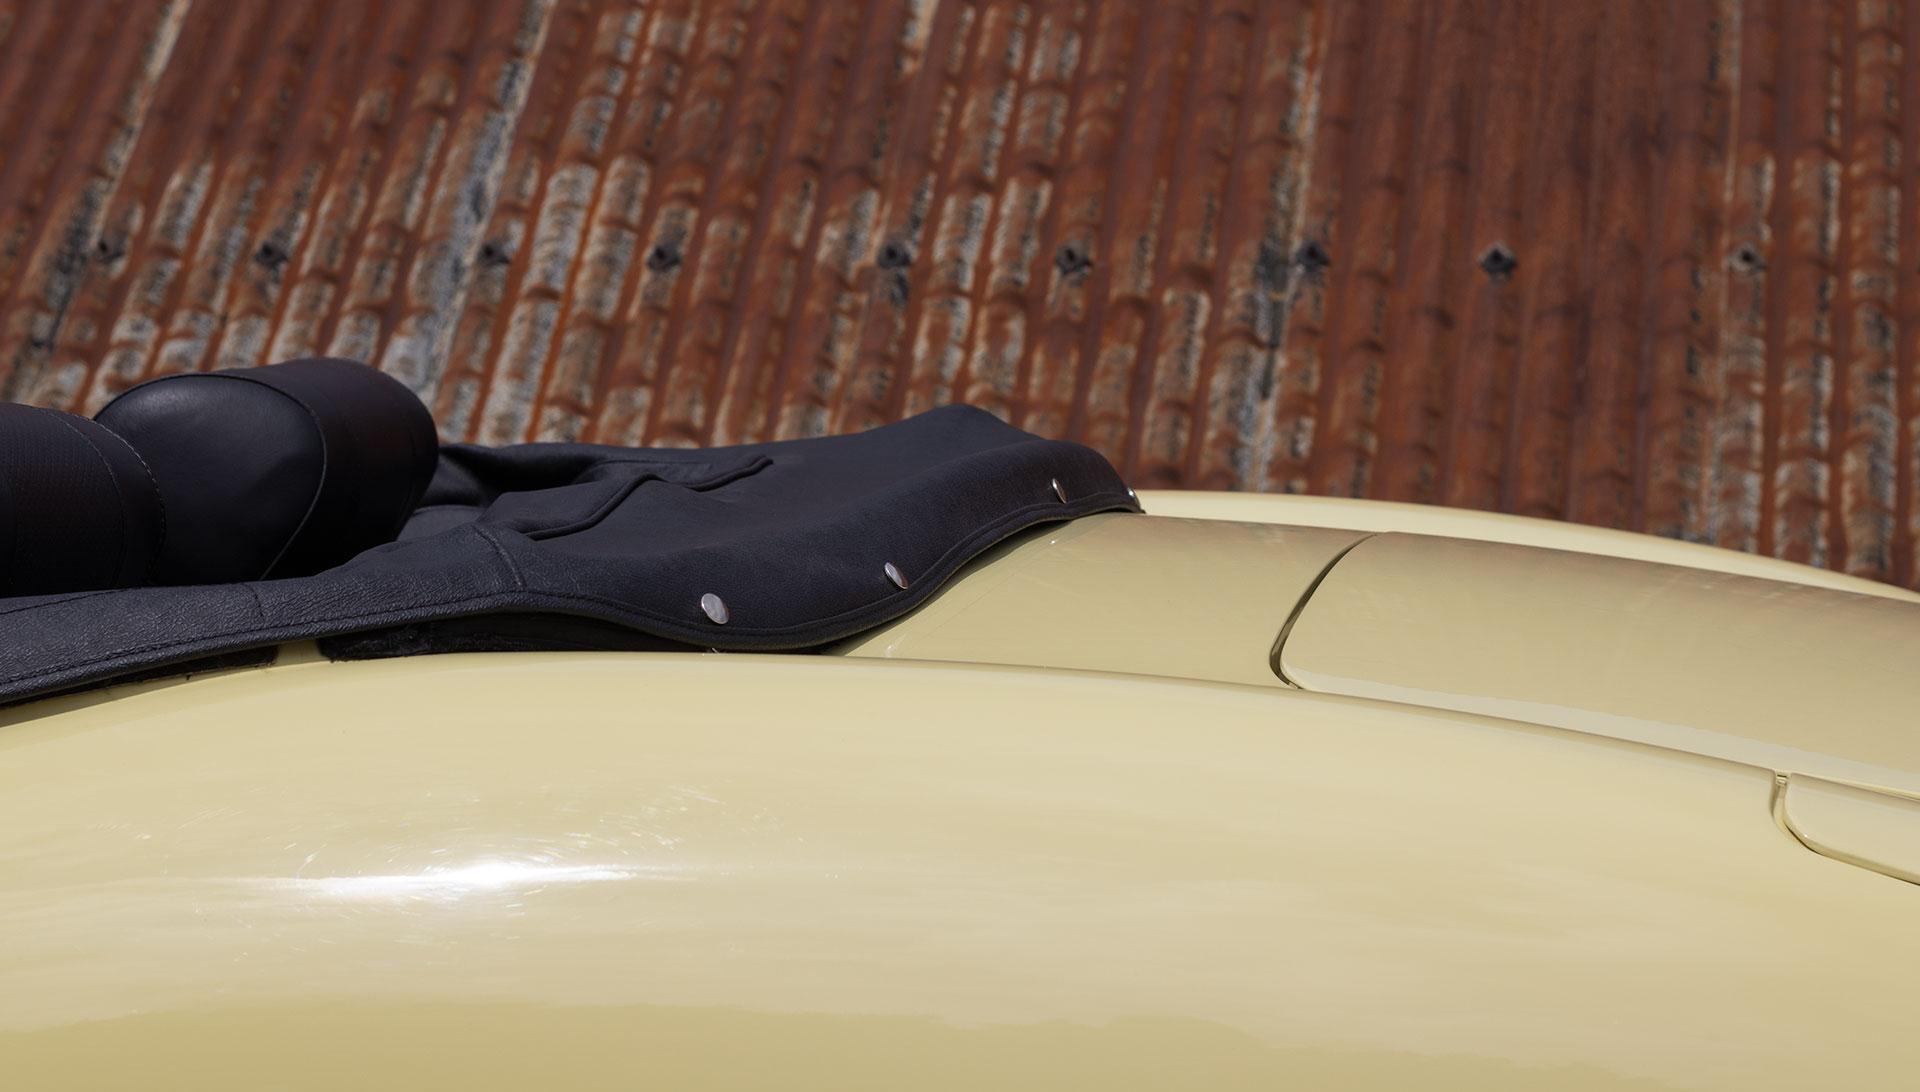 1972 Jaguar E-type Series III Roadster for sale at The Classic Motor Hub